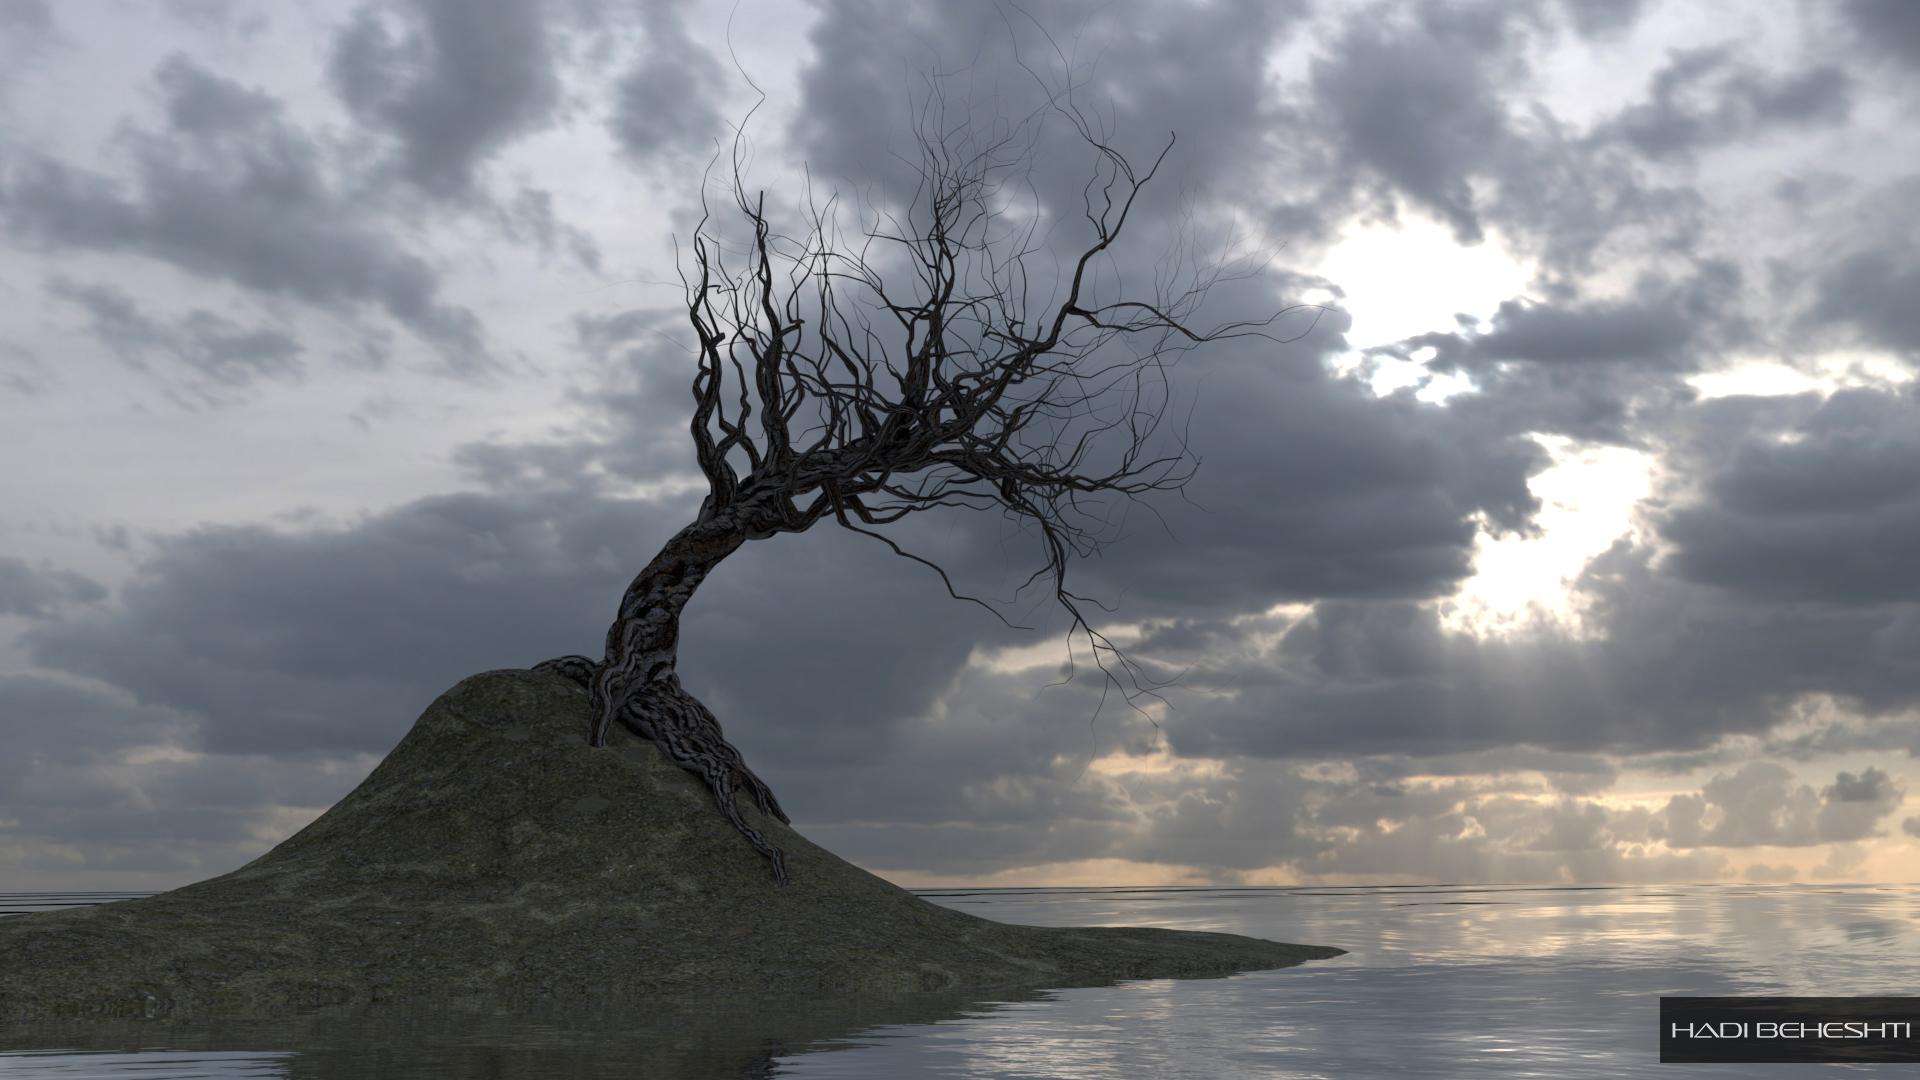 Alone-Personals by Hadi Beheshti